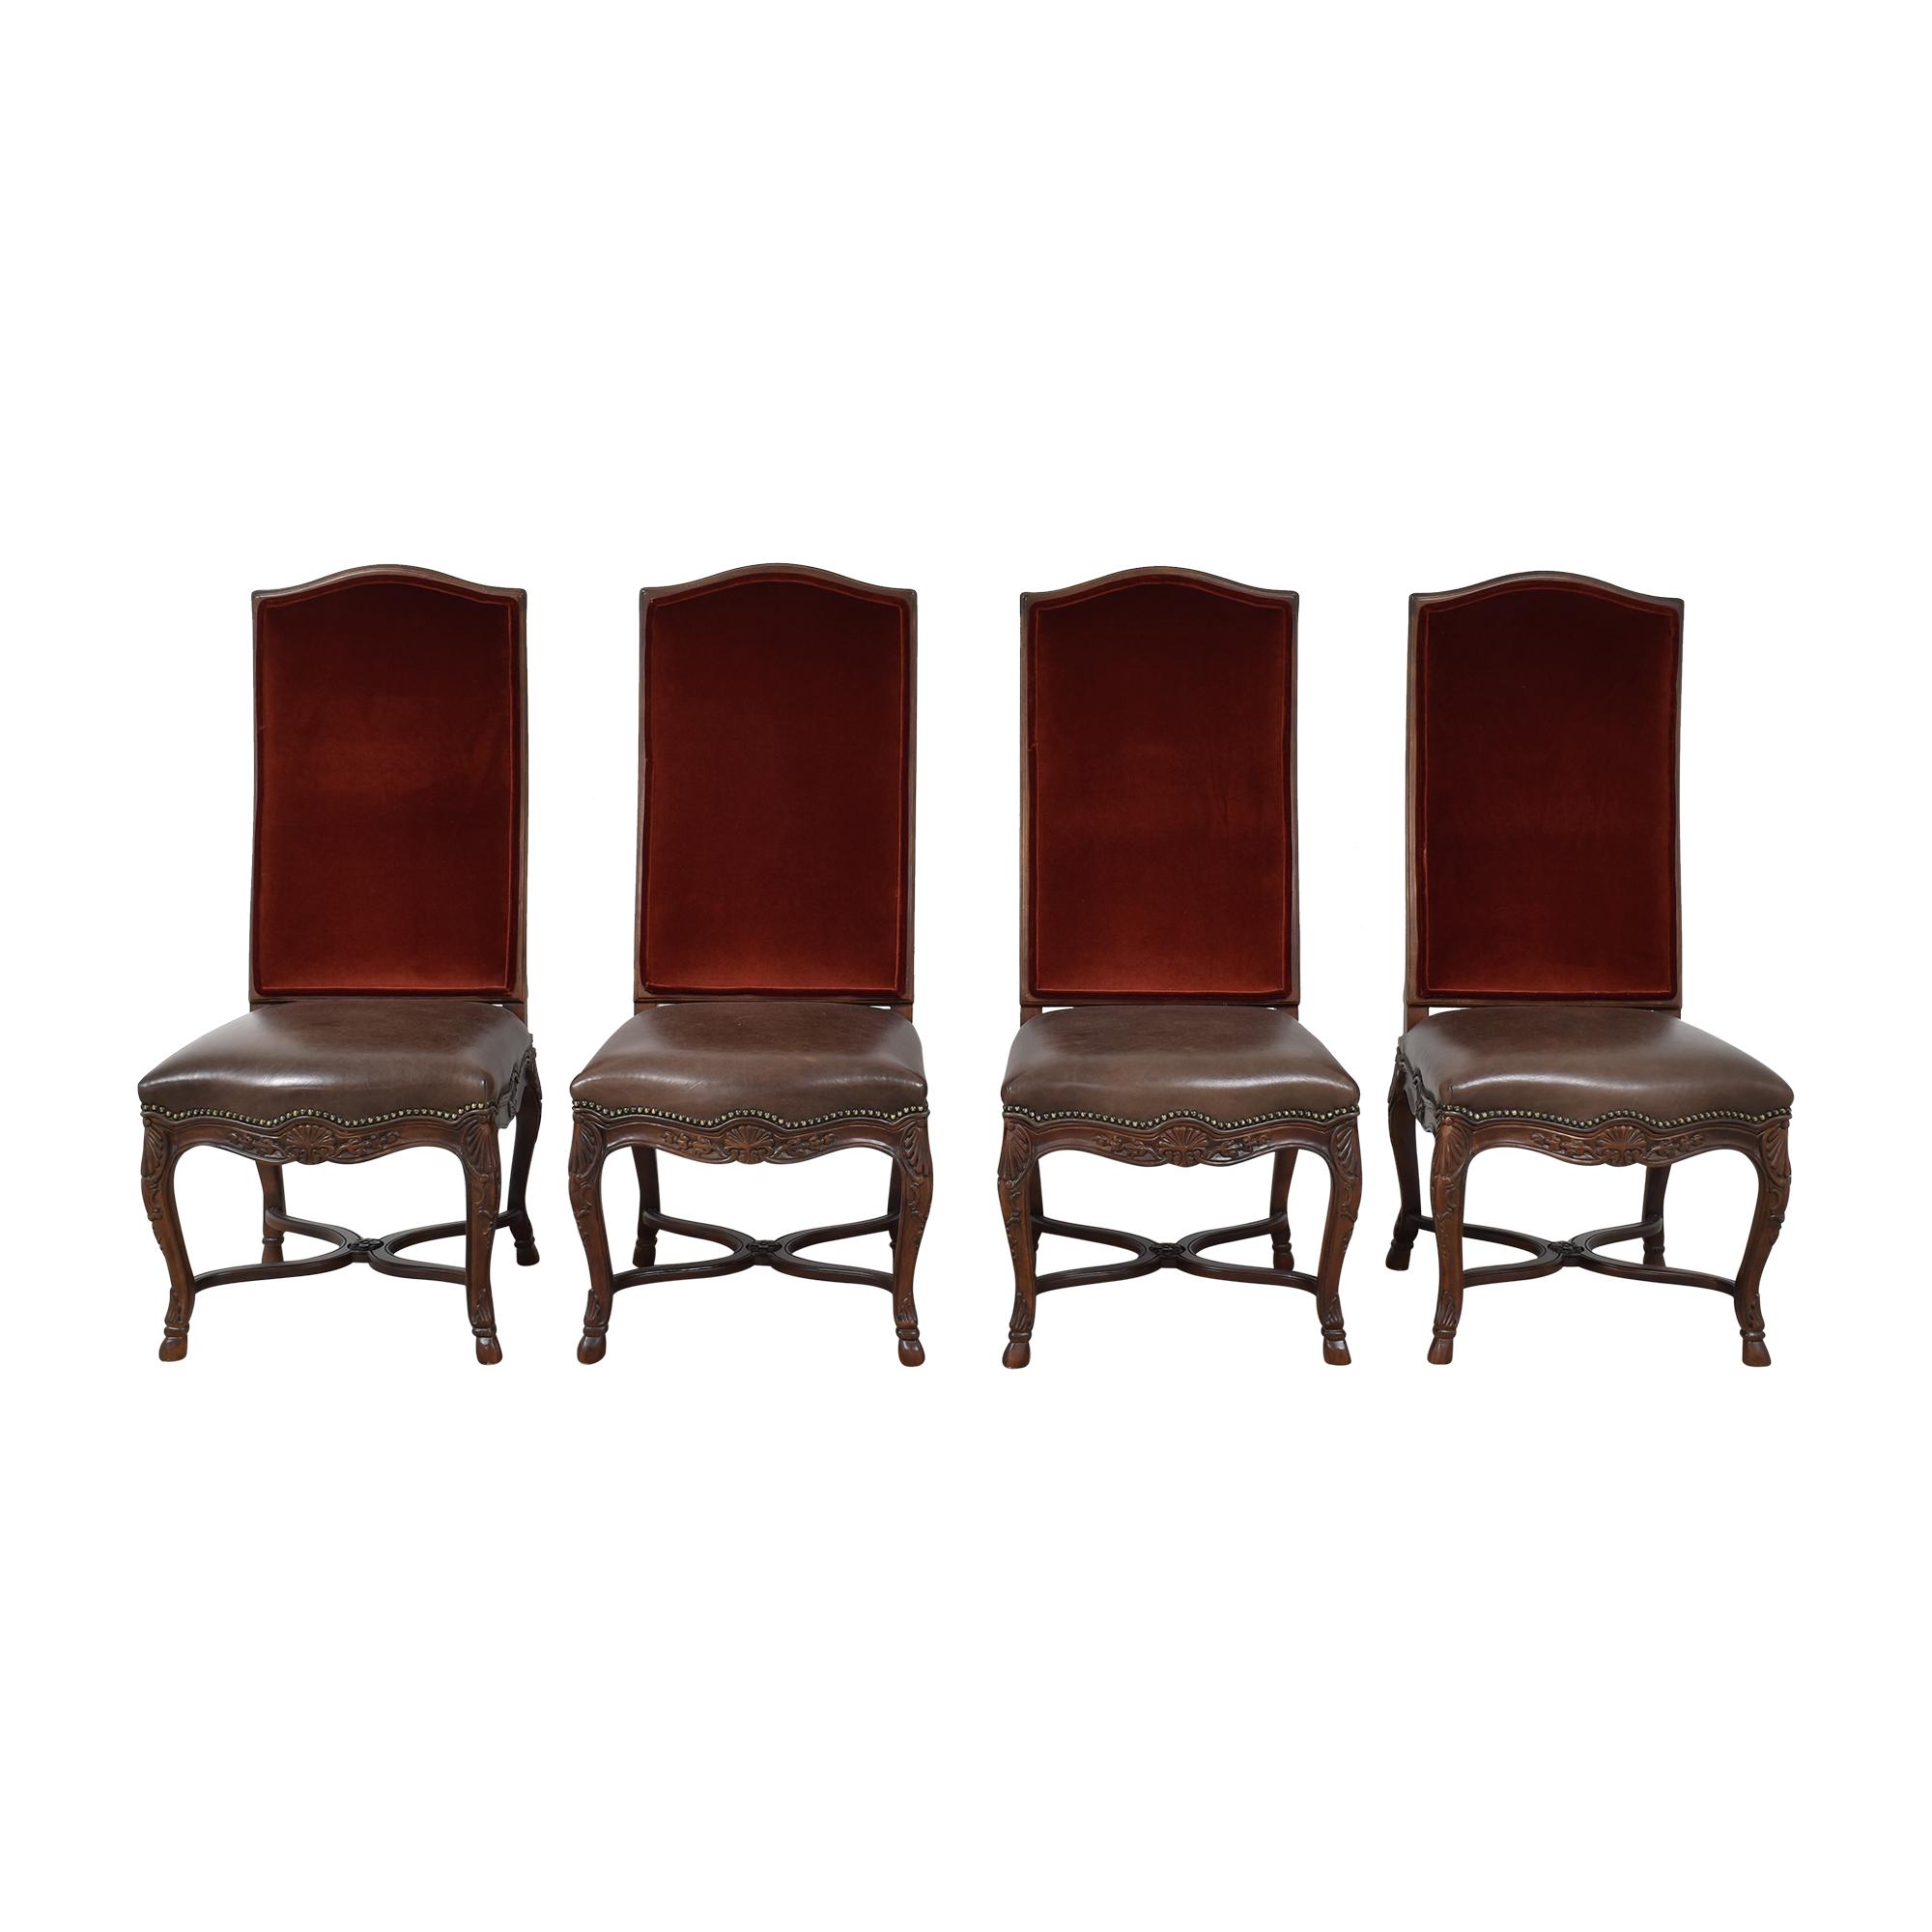 Safavieh Safavieh High Back Formal Dining Chairs used